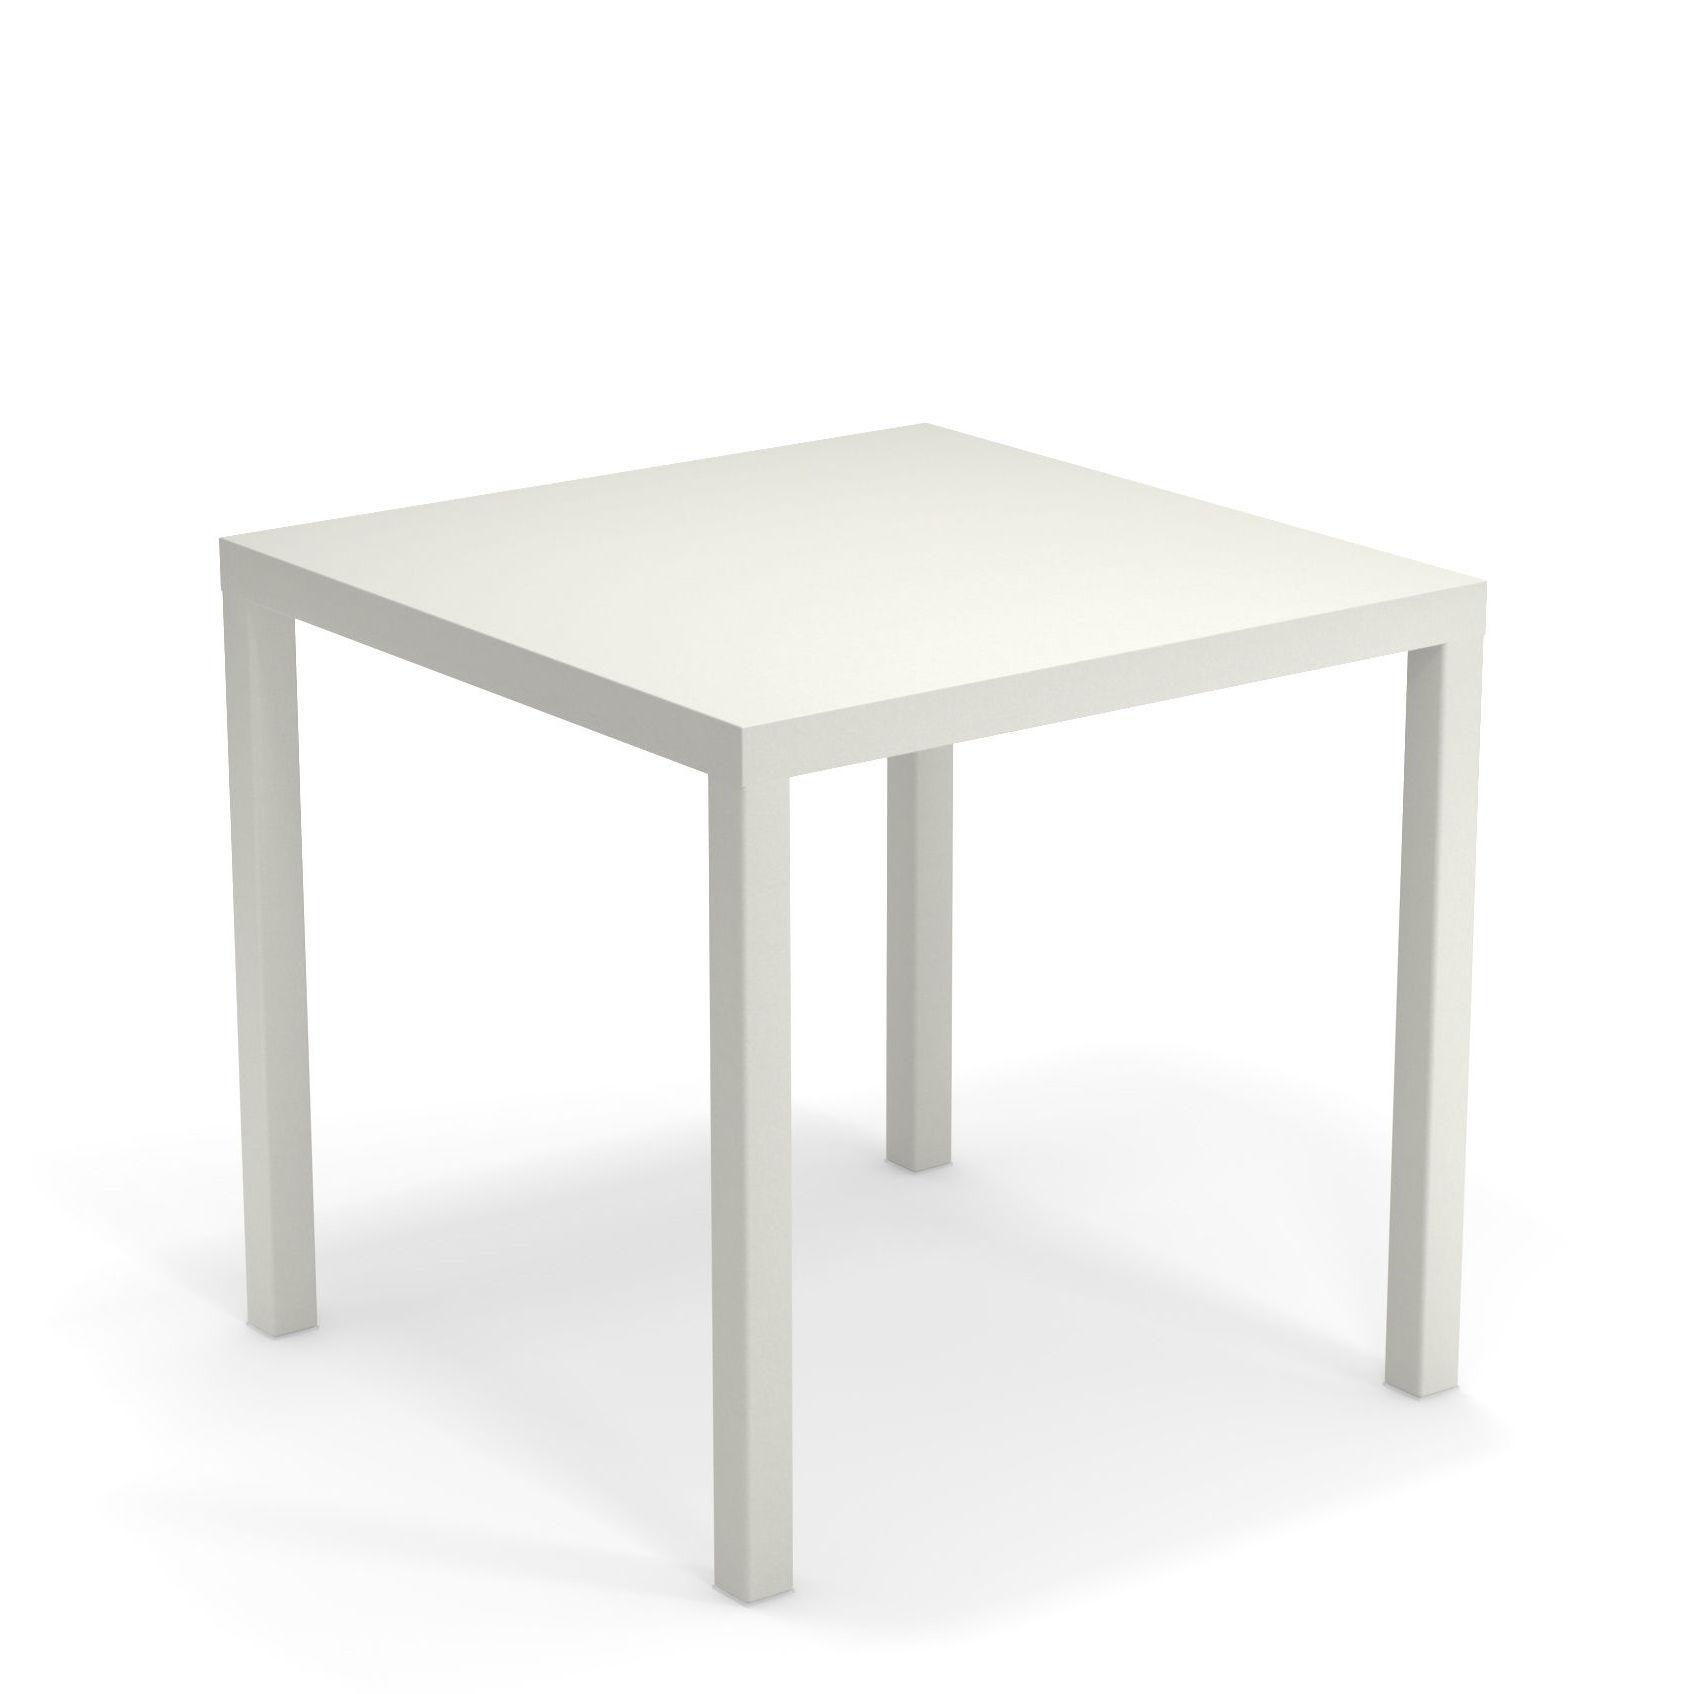 Outdoor - Garden Tables - Nova Table carrée - / Metal - 80 x 80 cm by Emu - White - Varnished steel